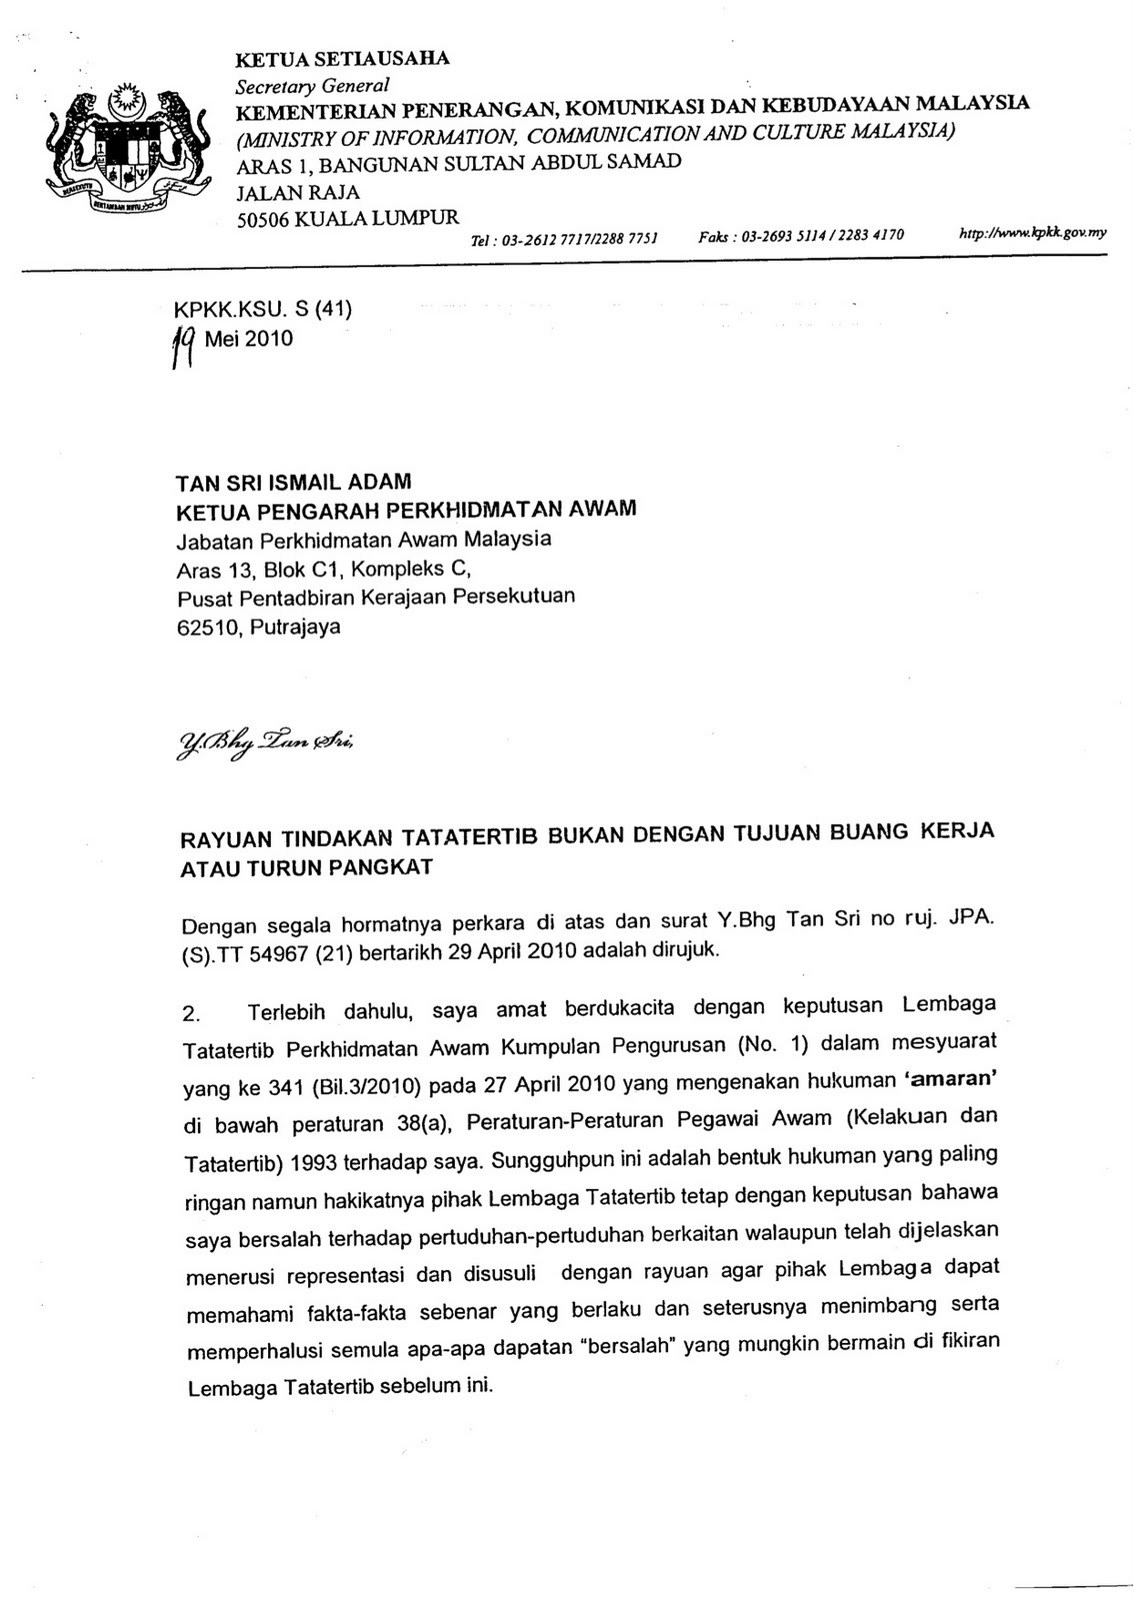 contoh surat rasmi format 2014 contoh o